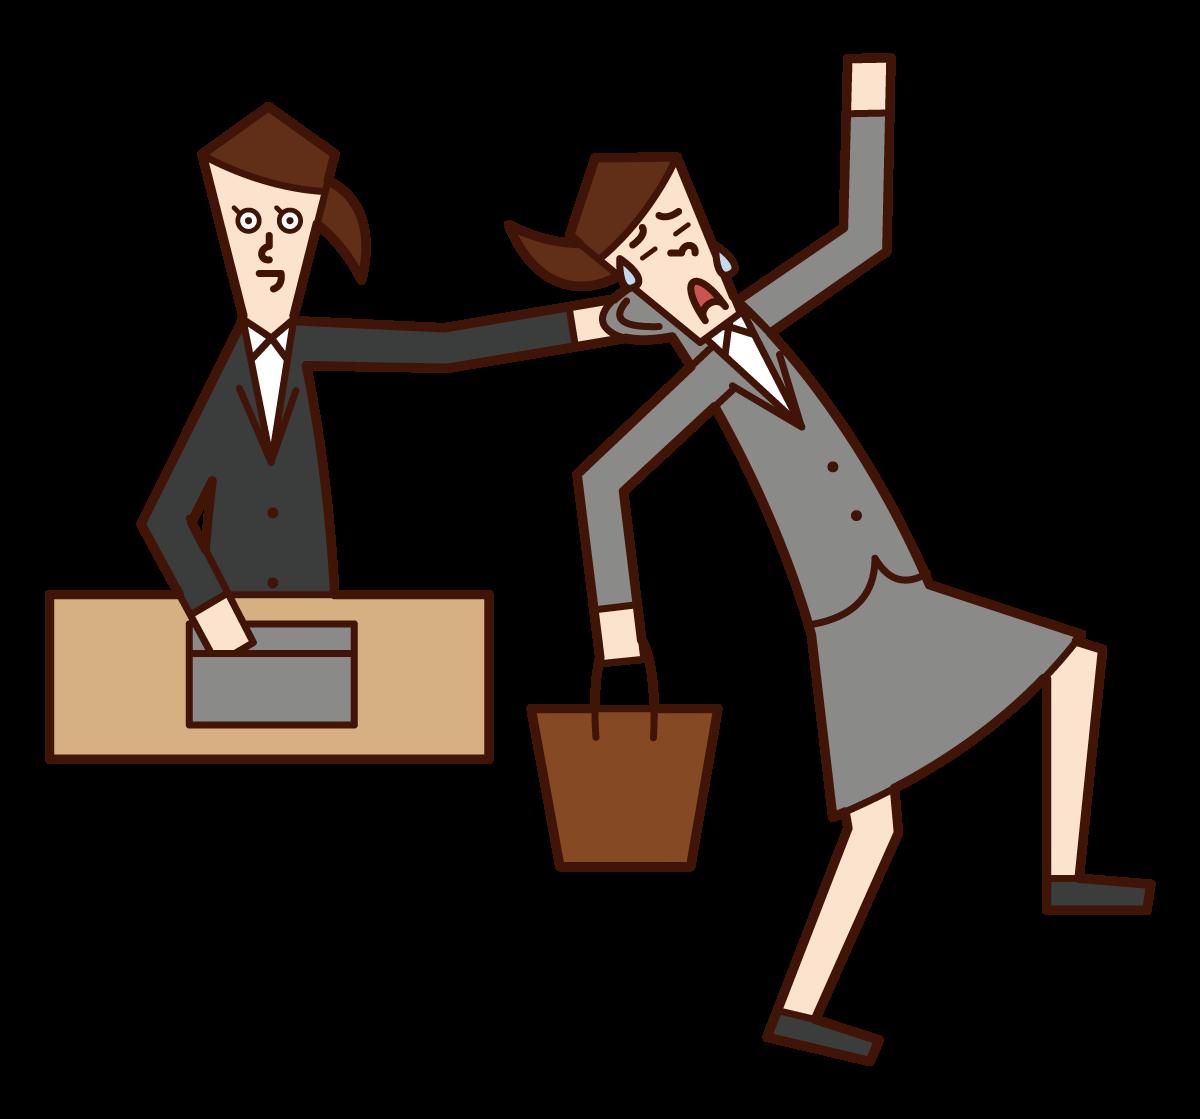 Illustration of a man grabbing a subordinate's neck